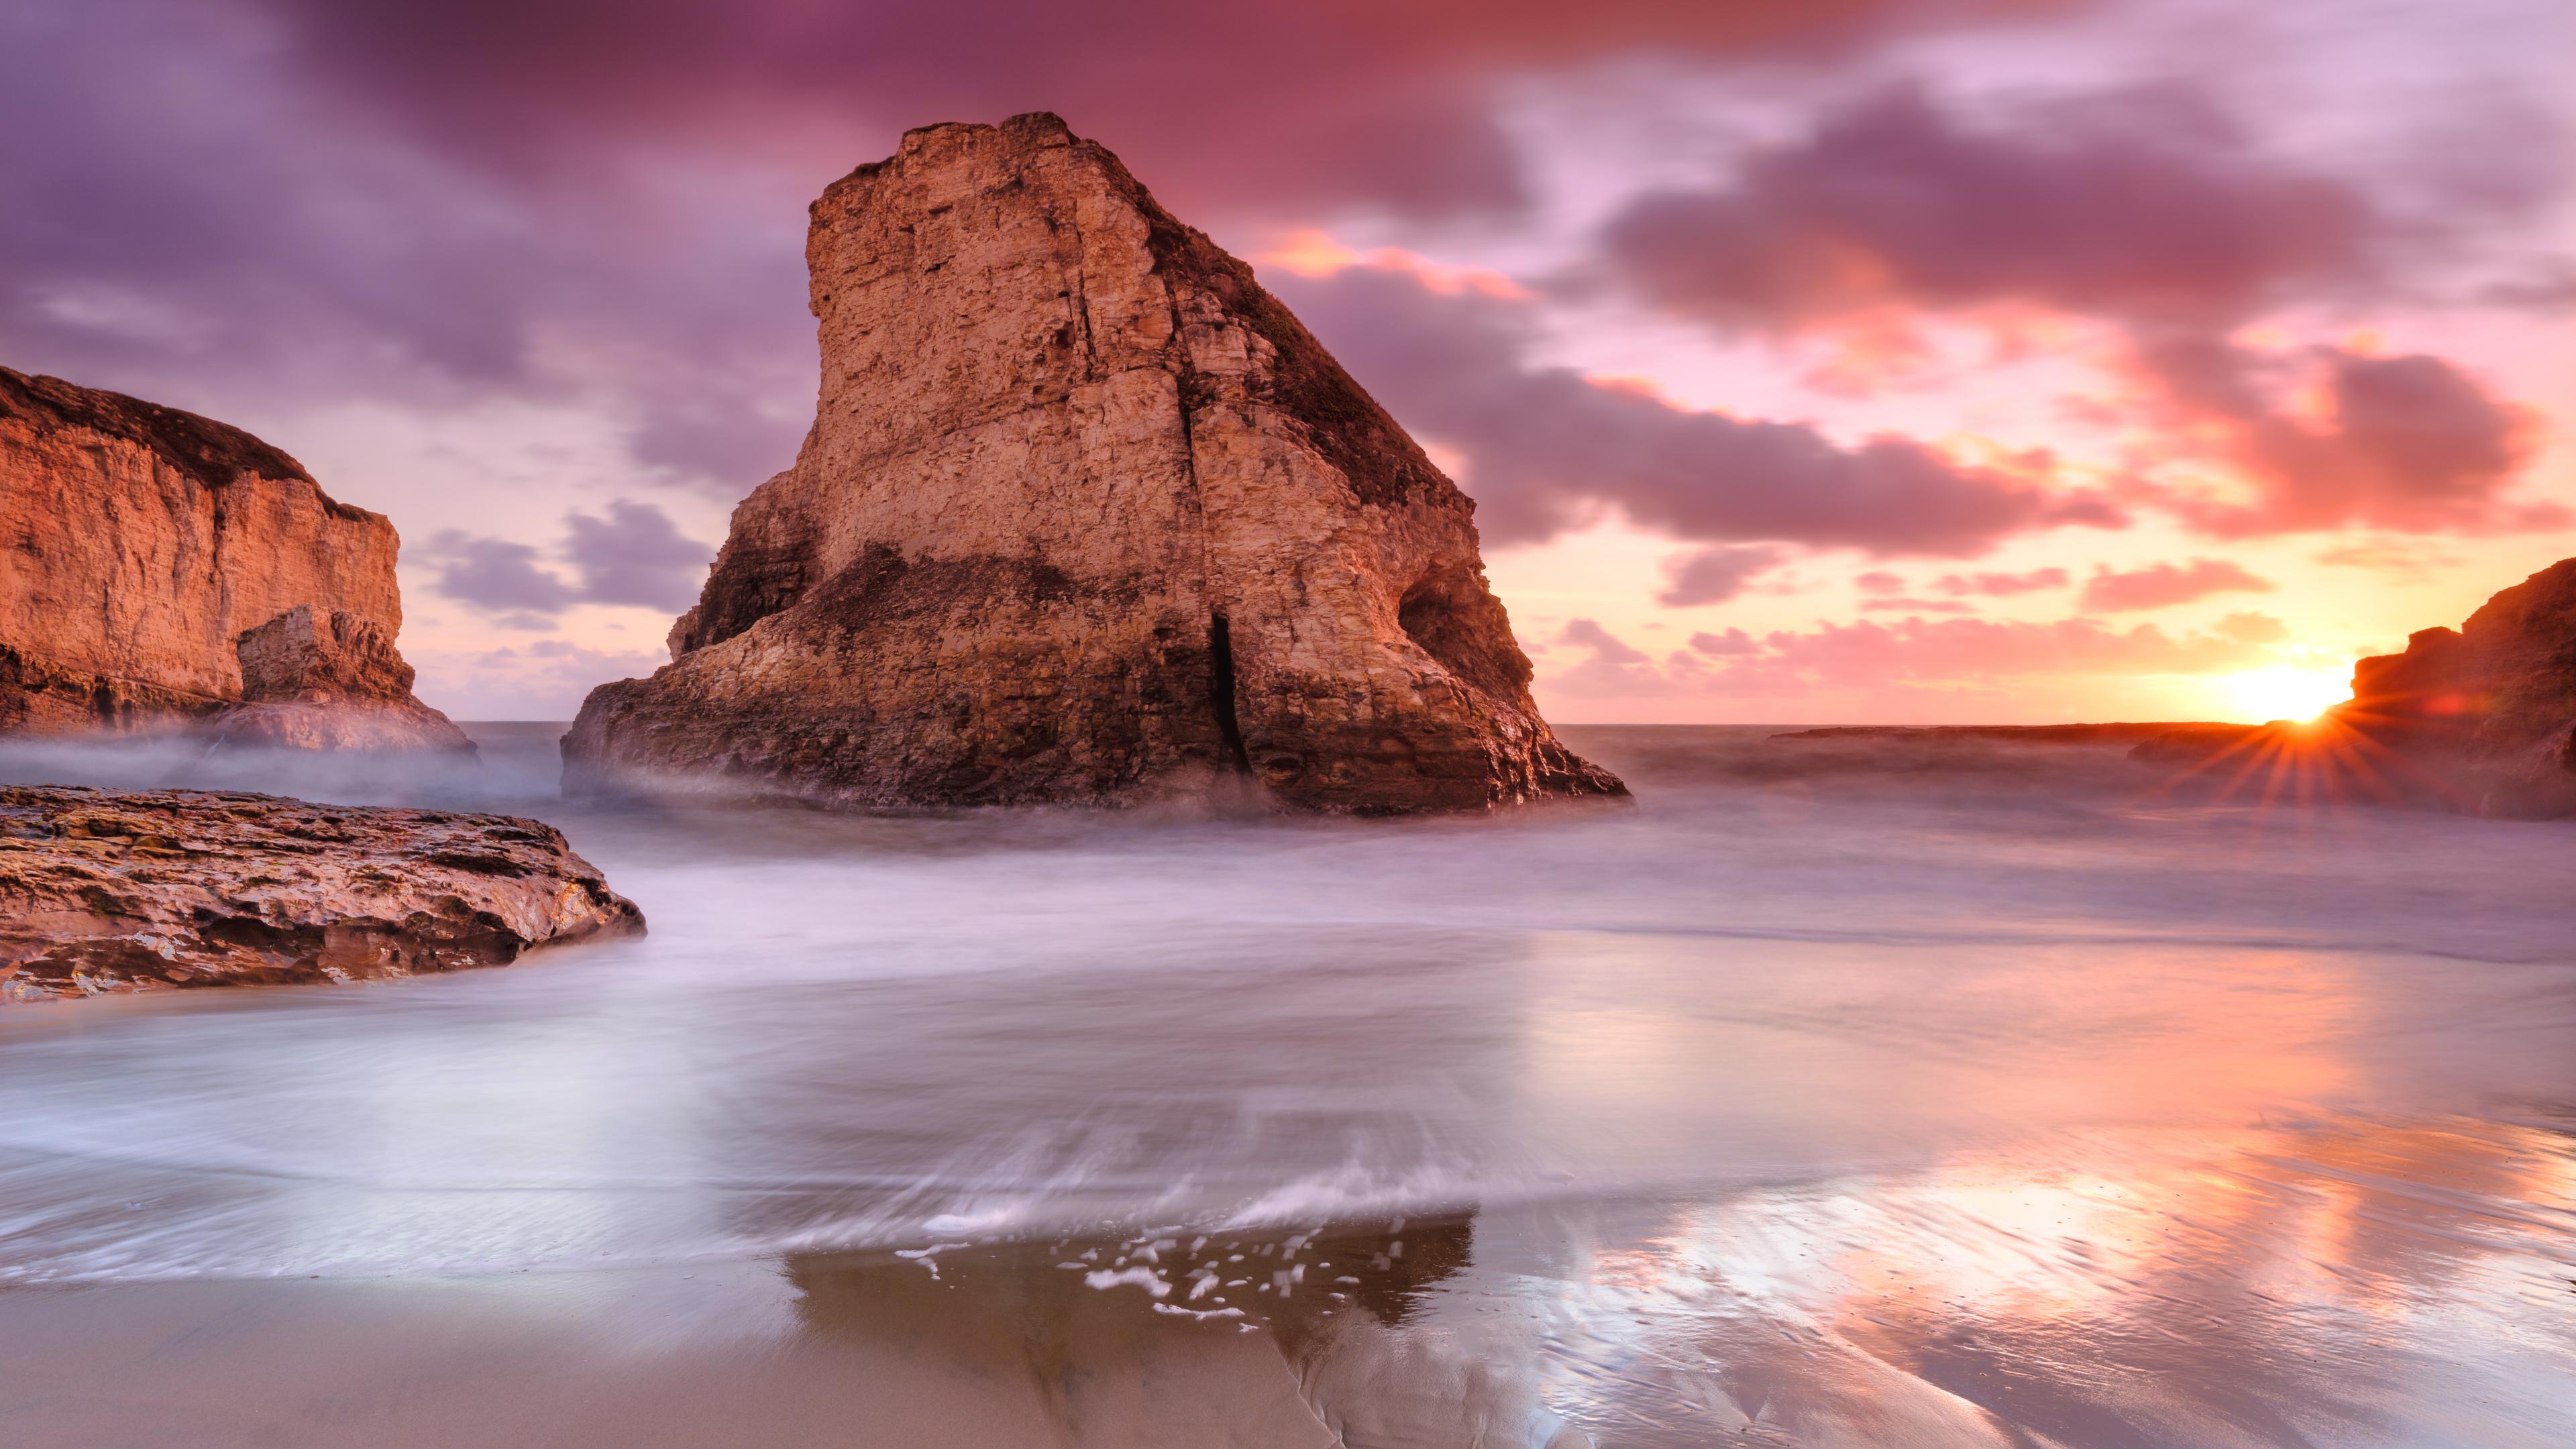 Wallpaper 4k Ocean Rocks Beach Sea Coast 4k 4k Wallpapers